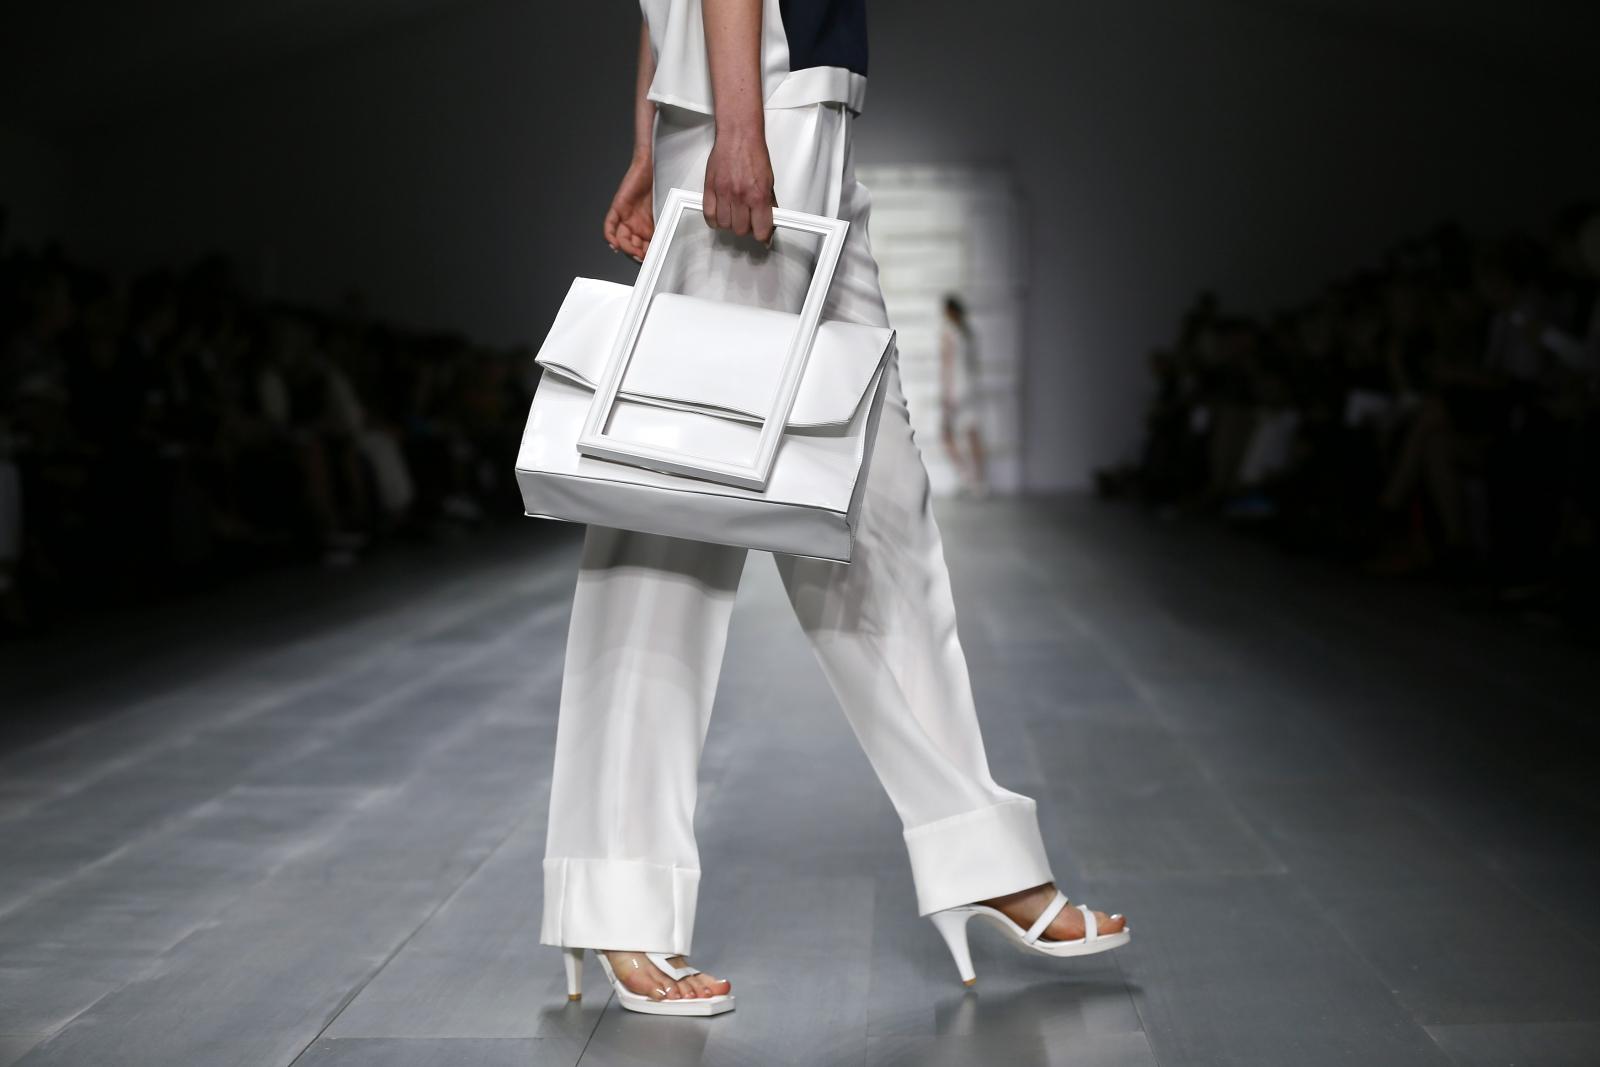 London Fashion Week - Day 1 - 12